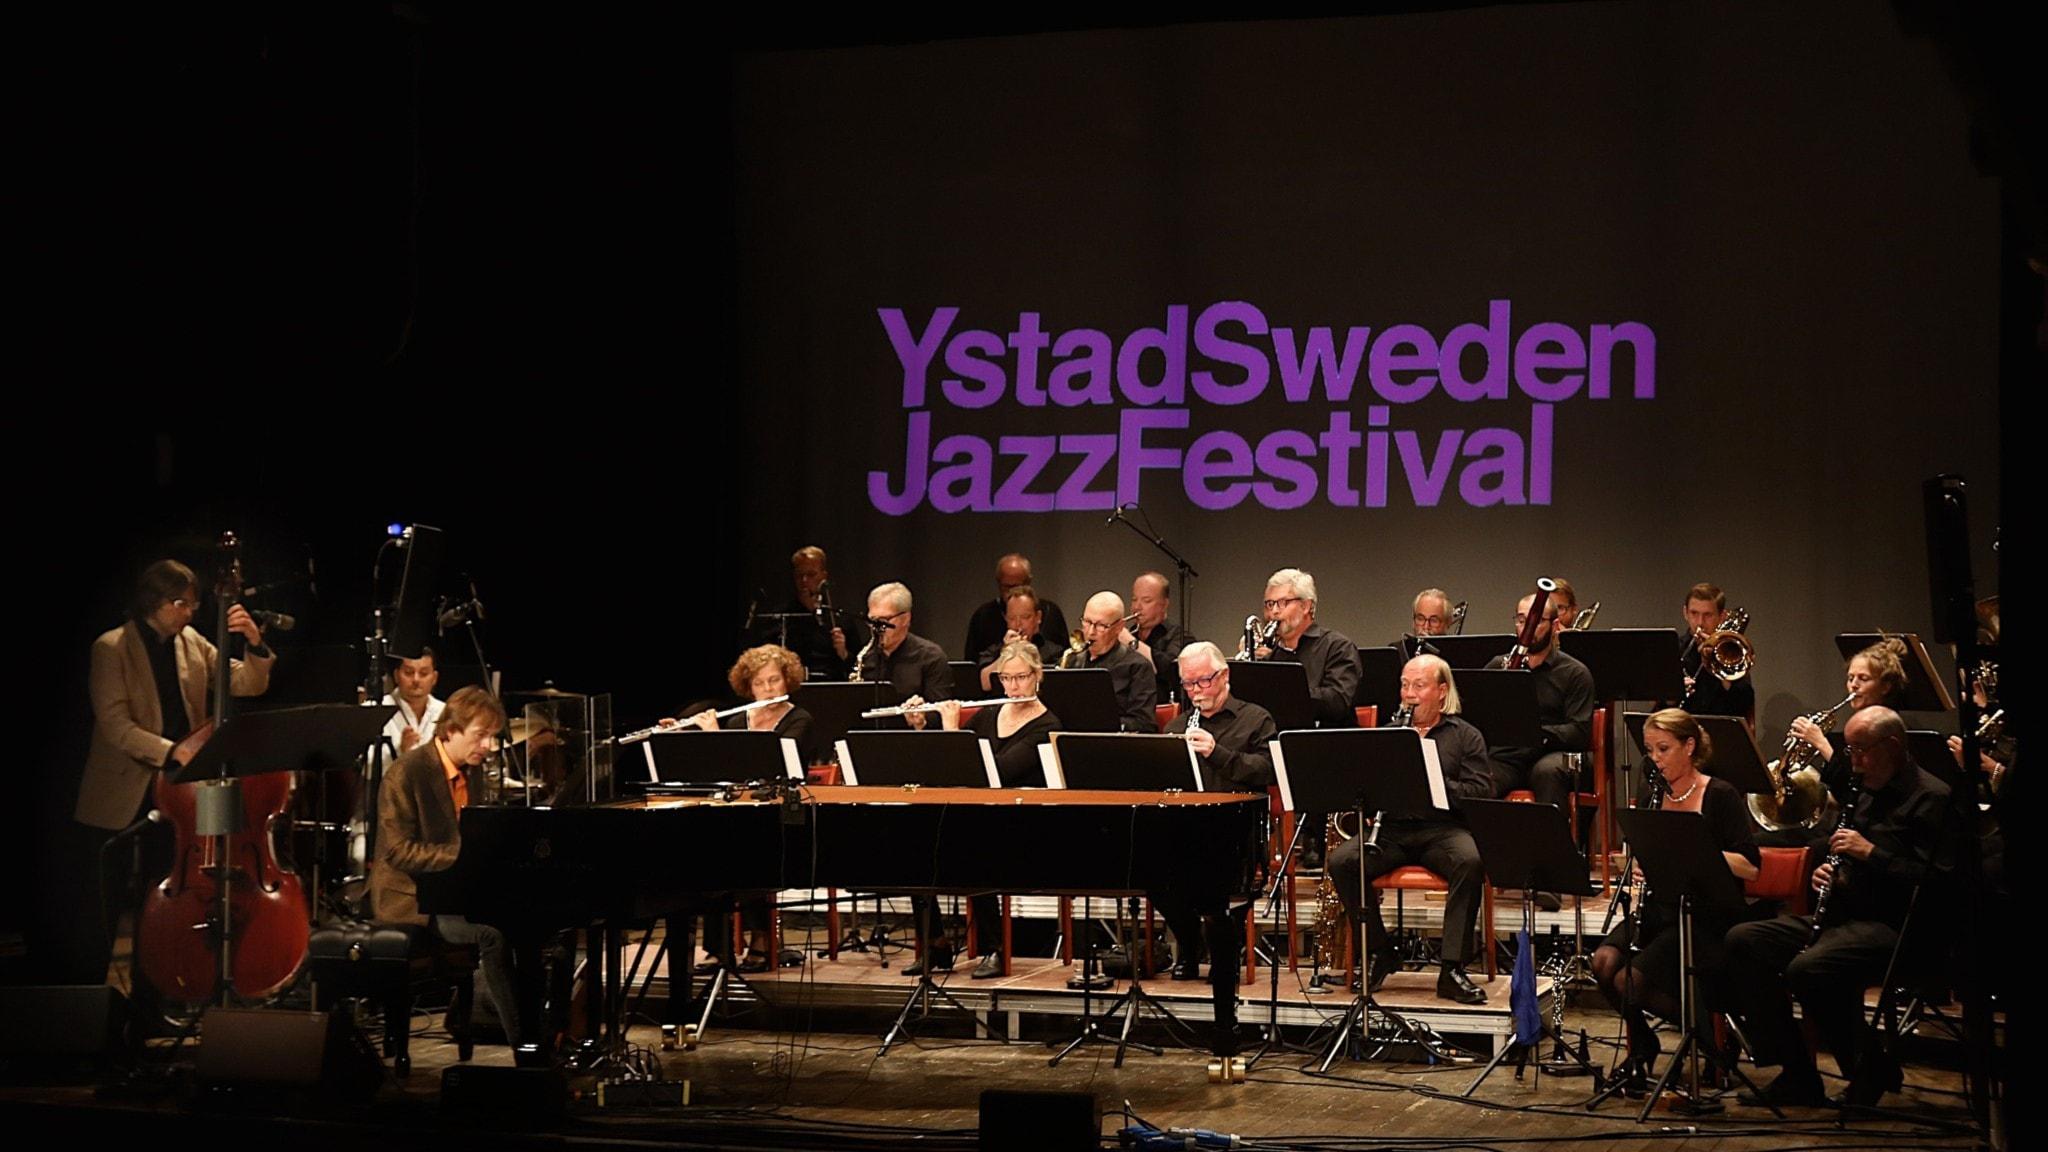 KONSERT: Jan Lundgren trio och Göteborg Wind Orchestra